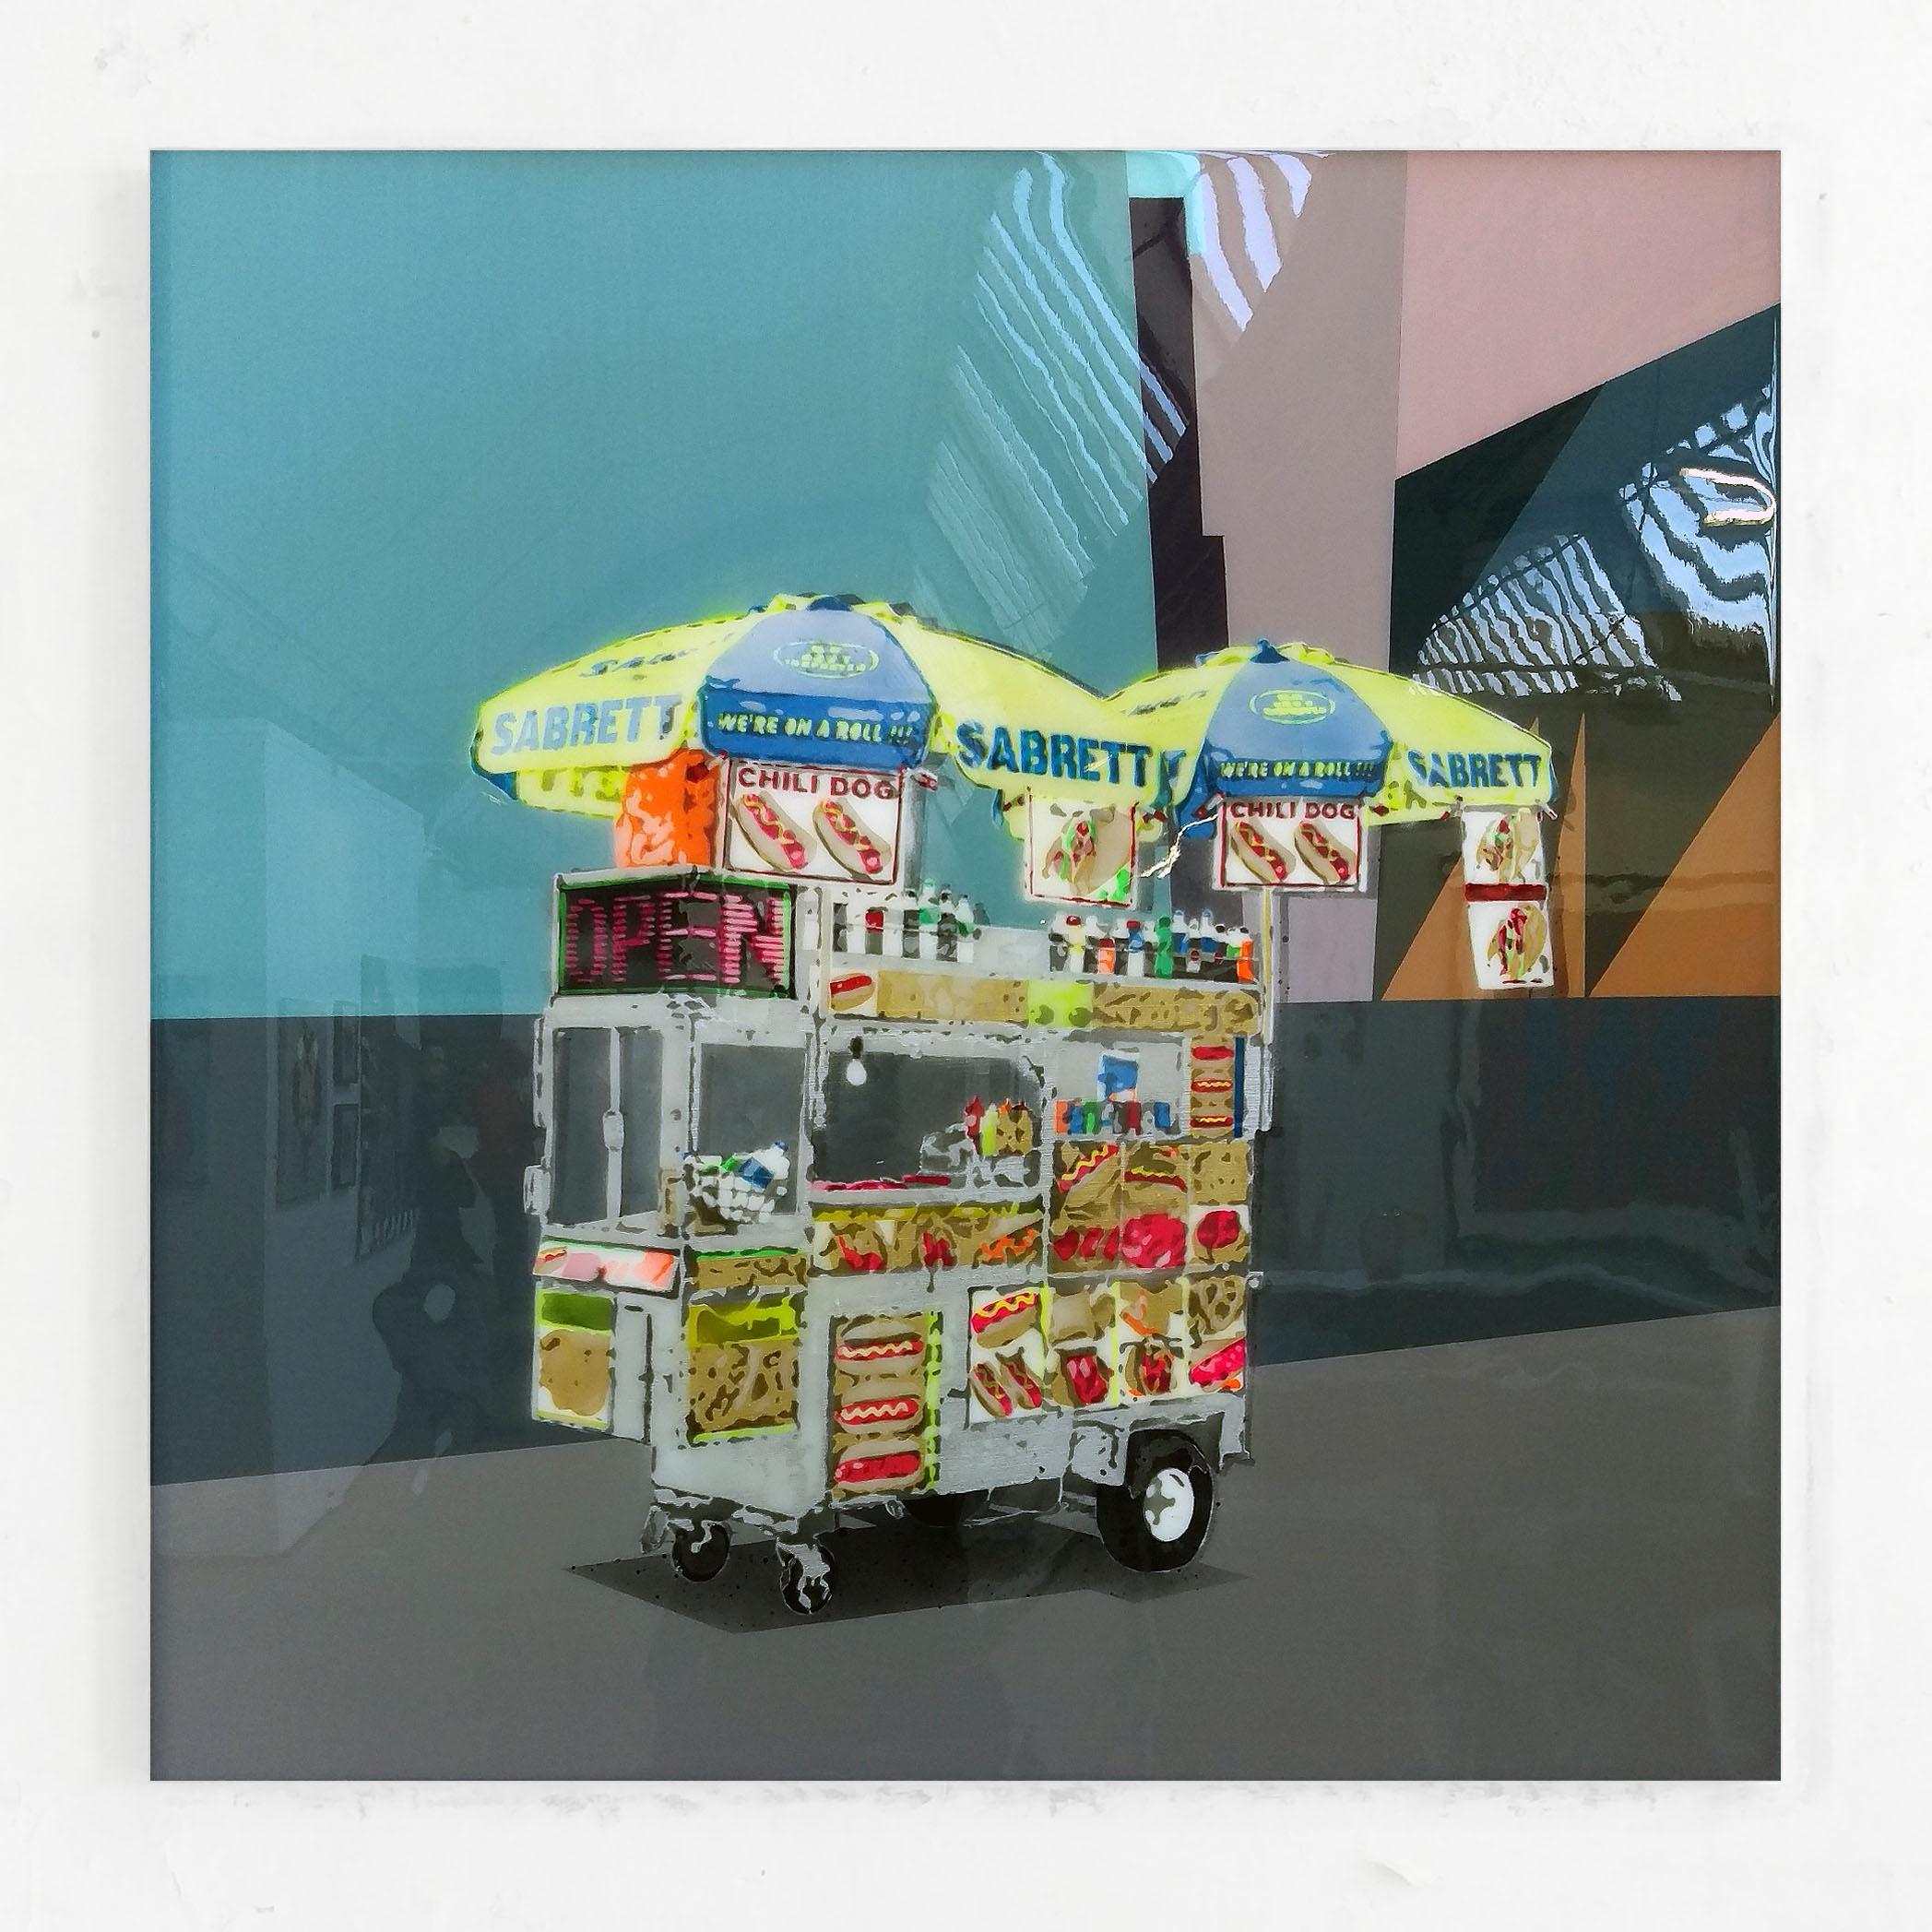 Hot Dog Cart No 1 | E L I O T